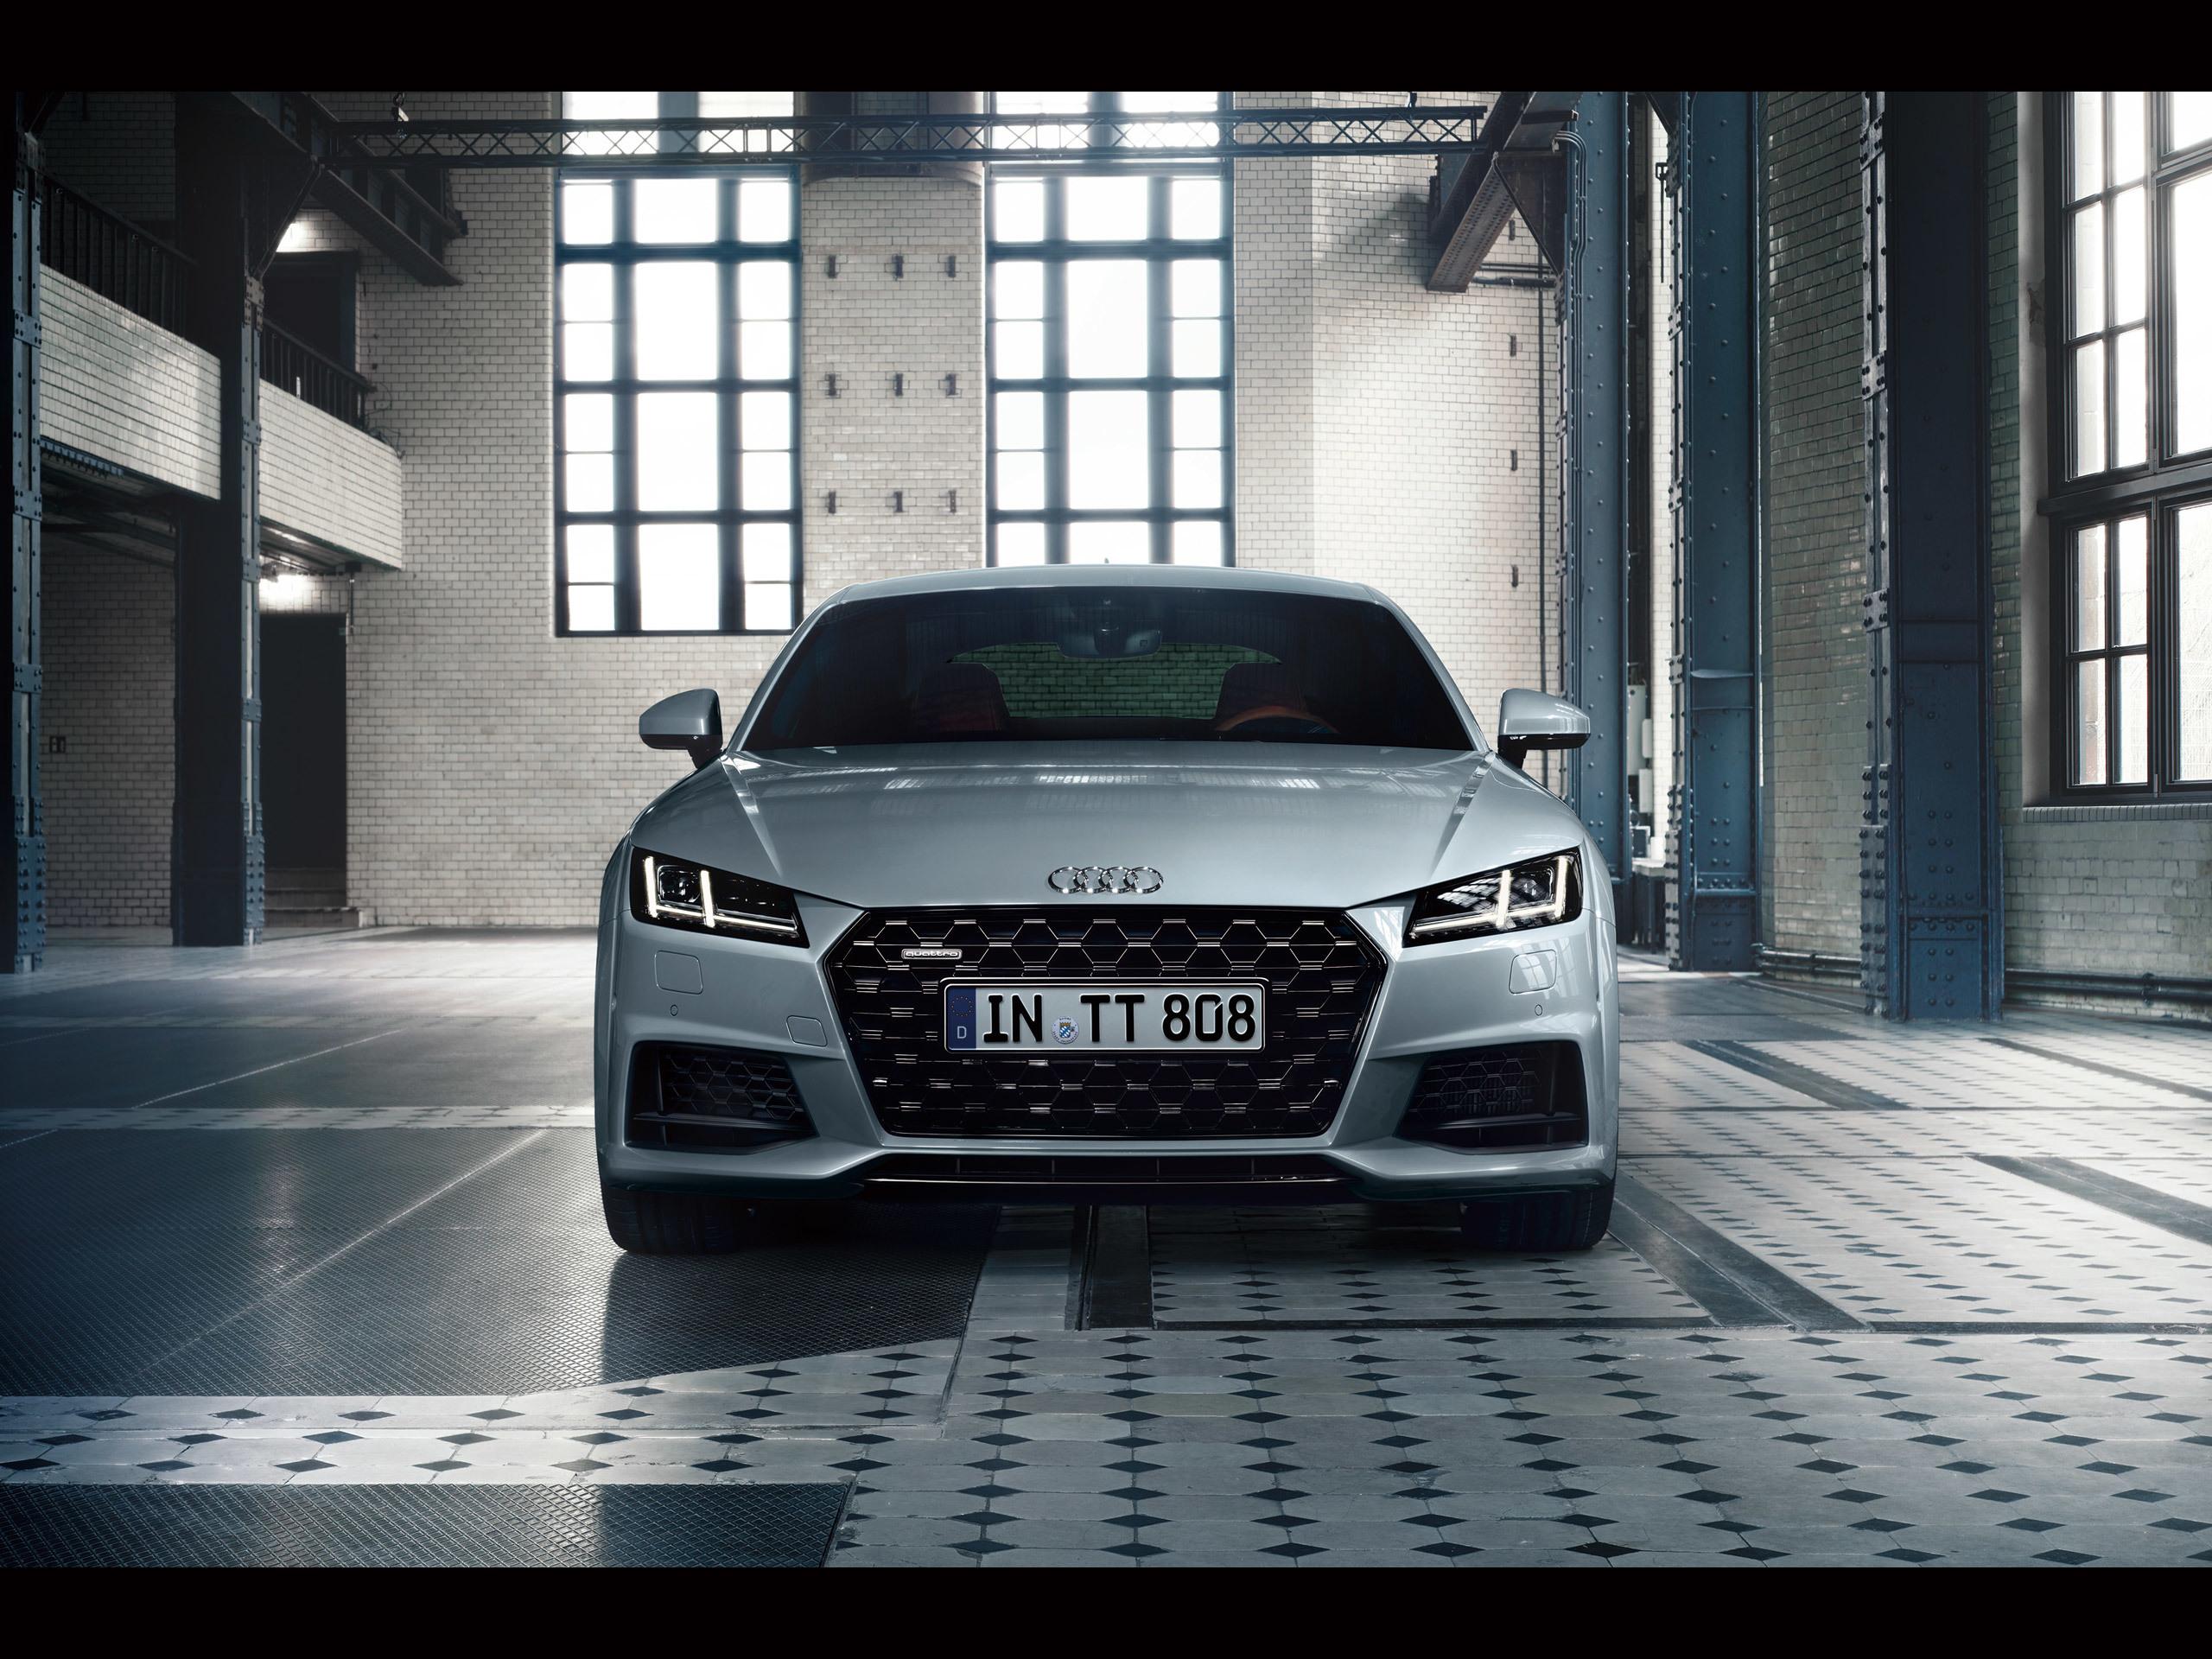 Audi Tt 20 Years 2019 アウディに嵌まる 壁紙画像ブログ